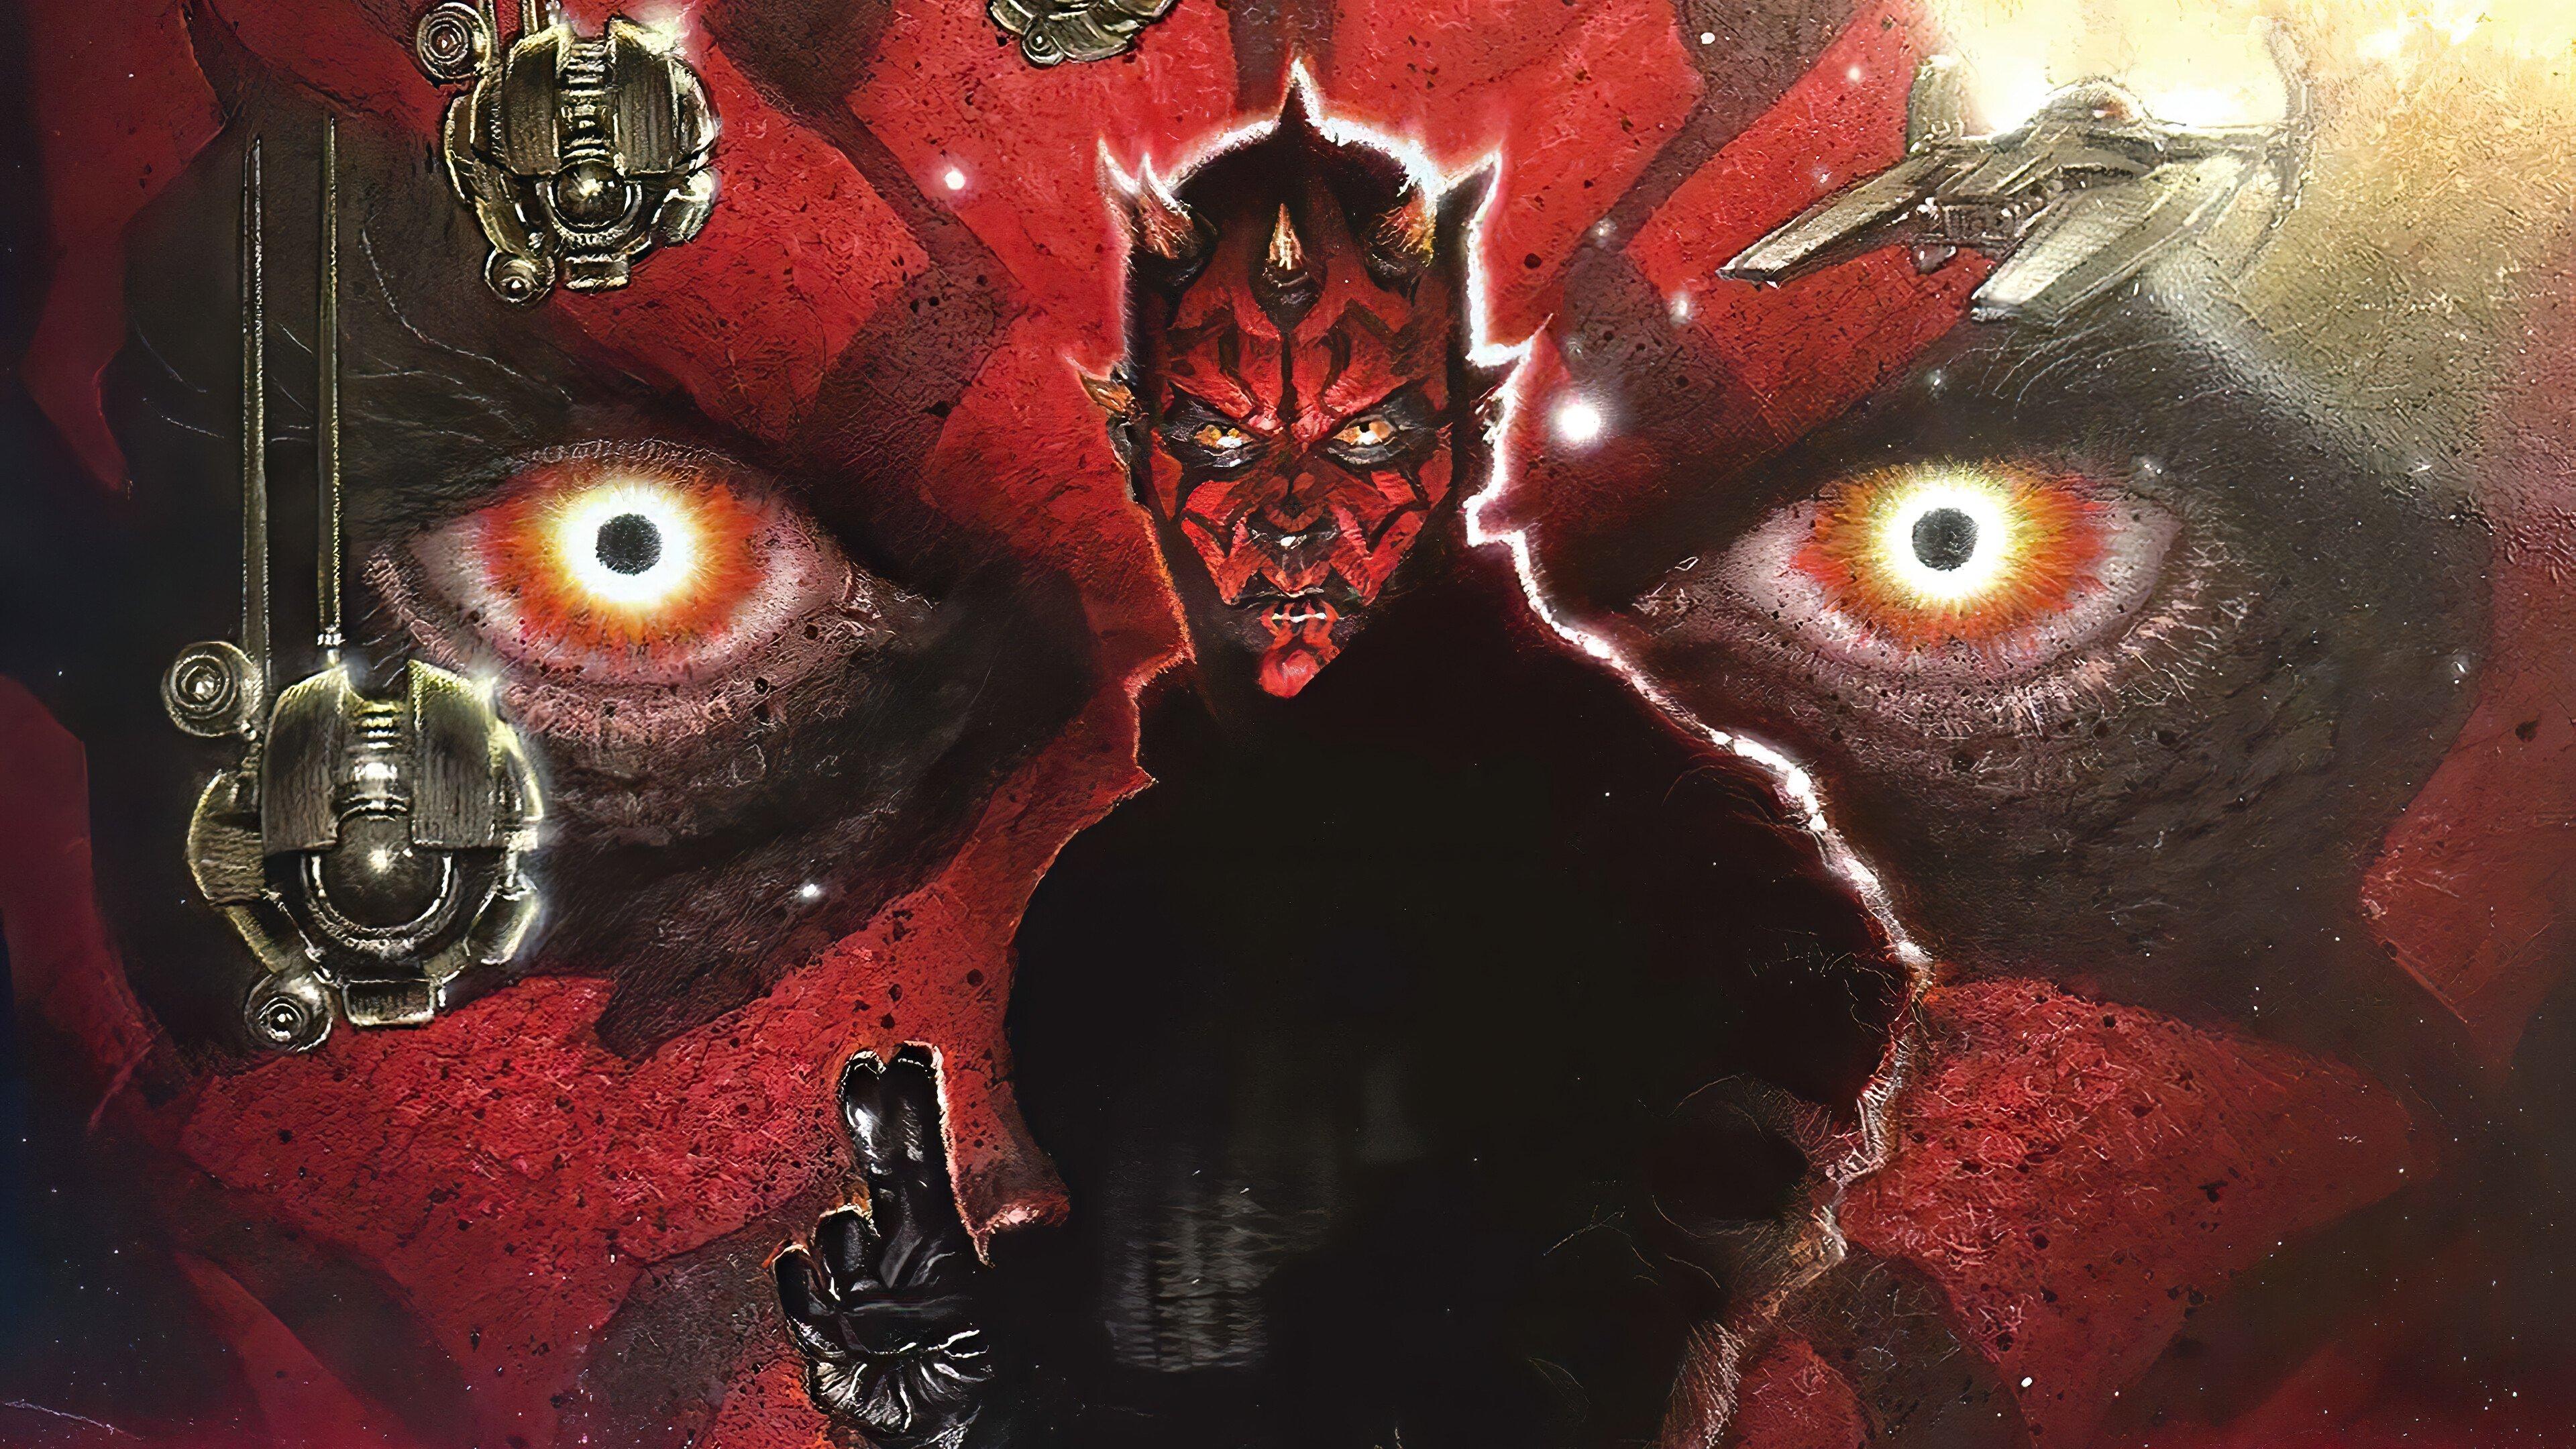 Wallpaper Darth Maul from Star Wars